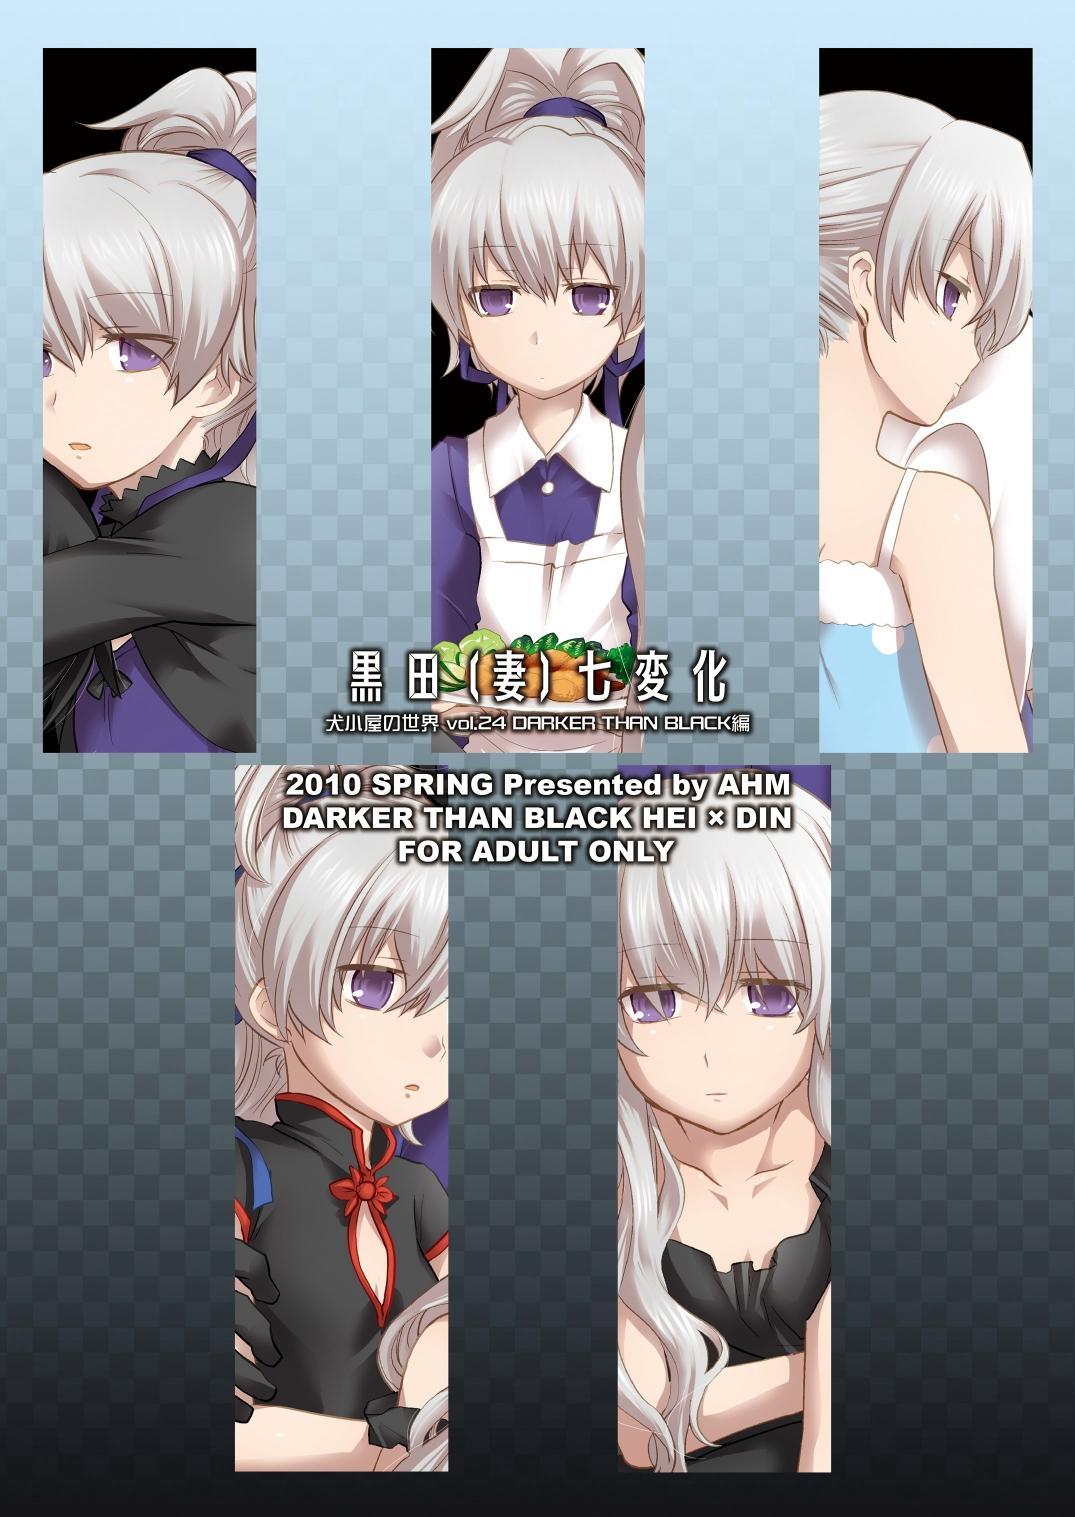 (COMIC1☆4) [AHM (Inu-Blade, Lact Mangan)] Kuroda (Tsuma) Shichihenge (DARKER THAN BLACK) 33